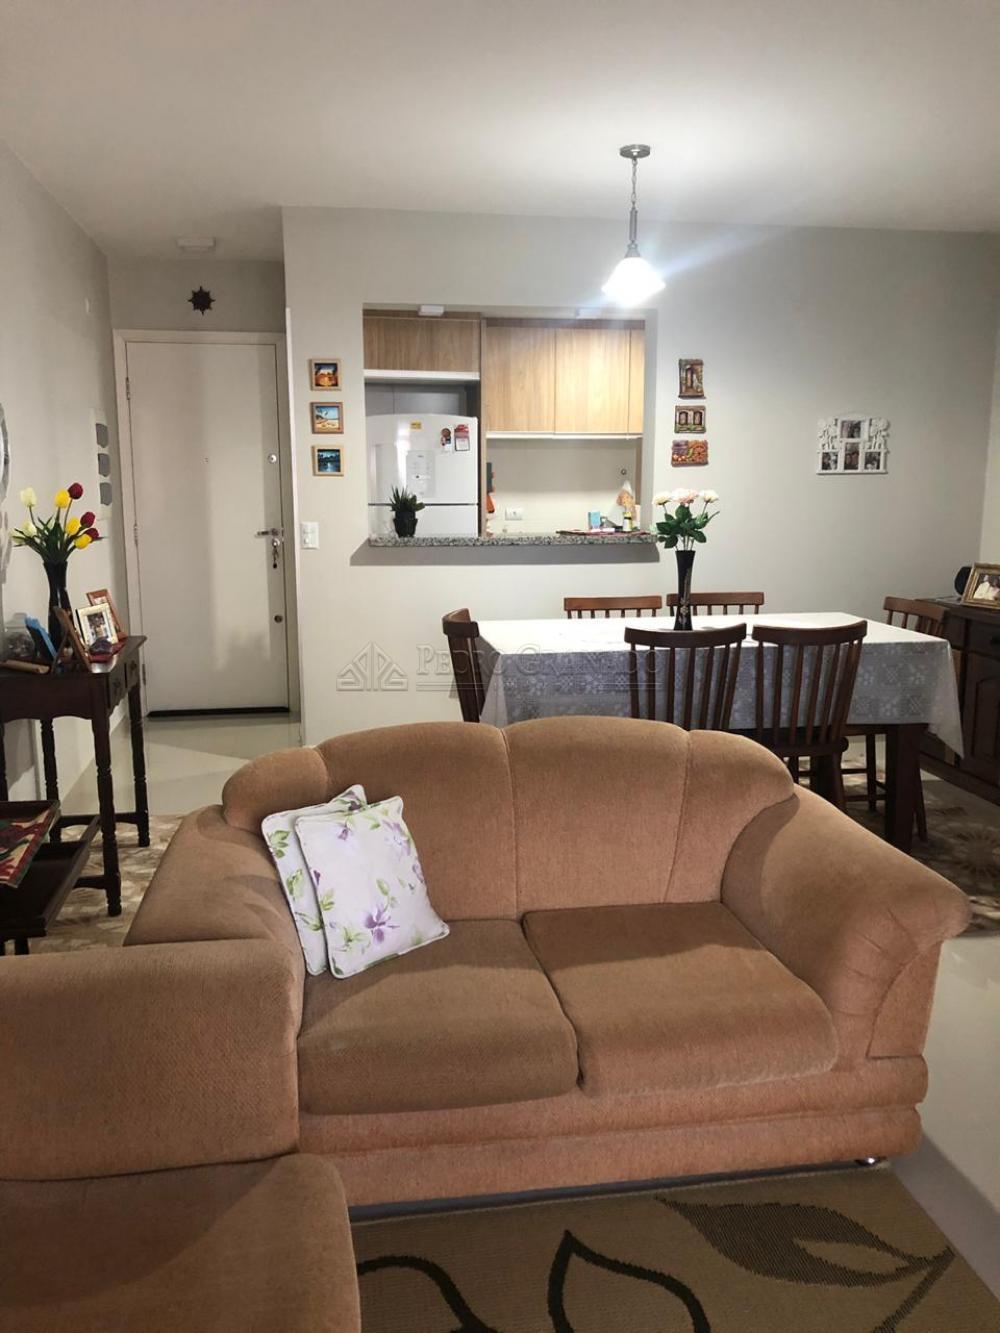 Maringa Apartamento Venda R$460.000,00 Condominio R$430,00 3 Dormitorios 1 Suite Area construida 82.63m2